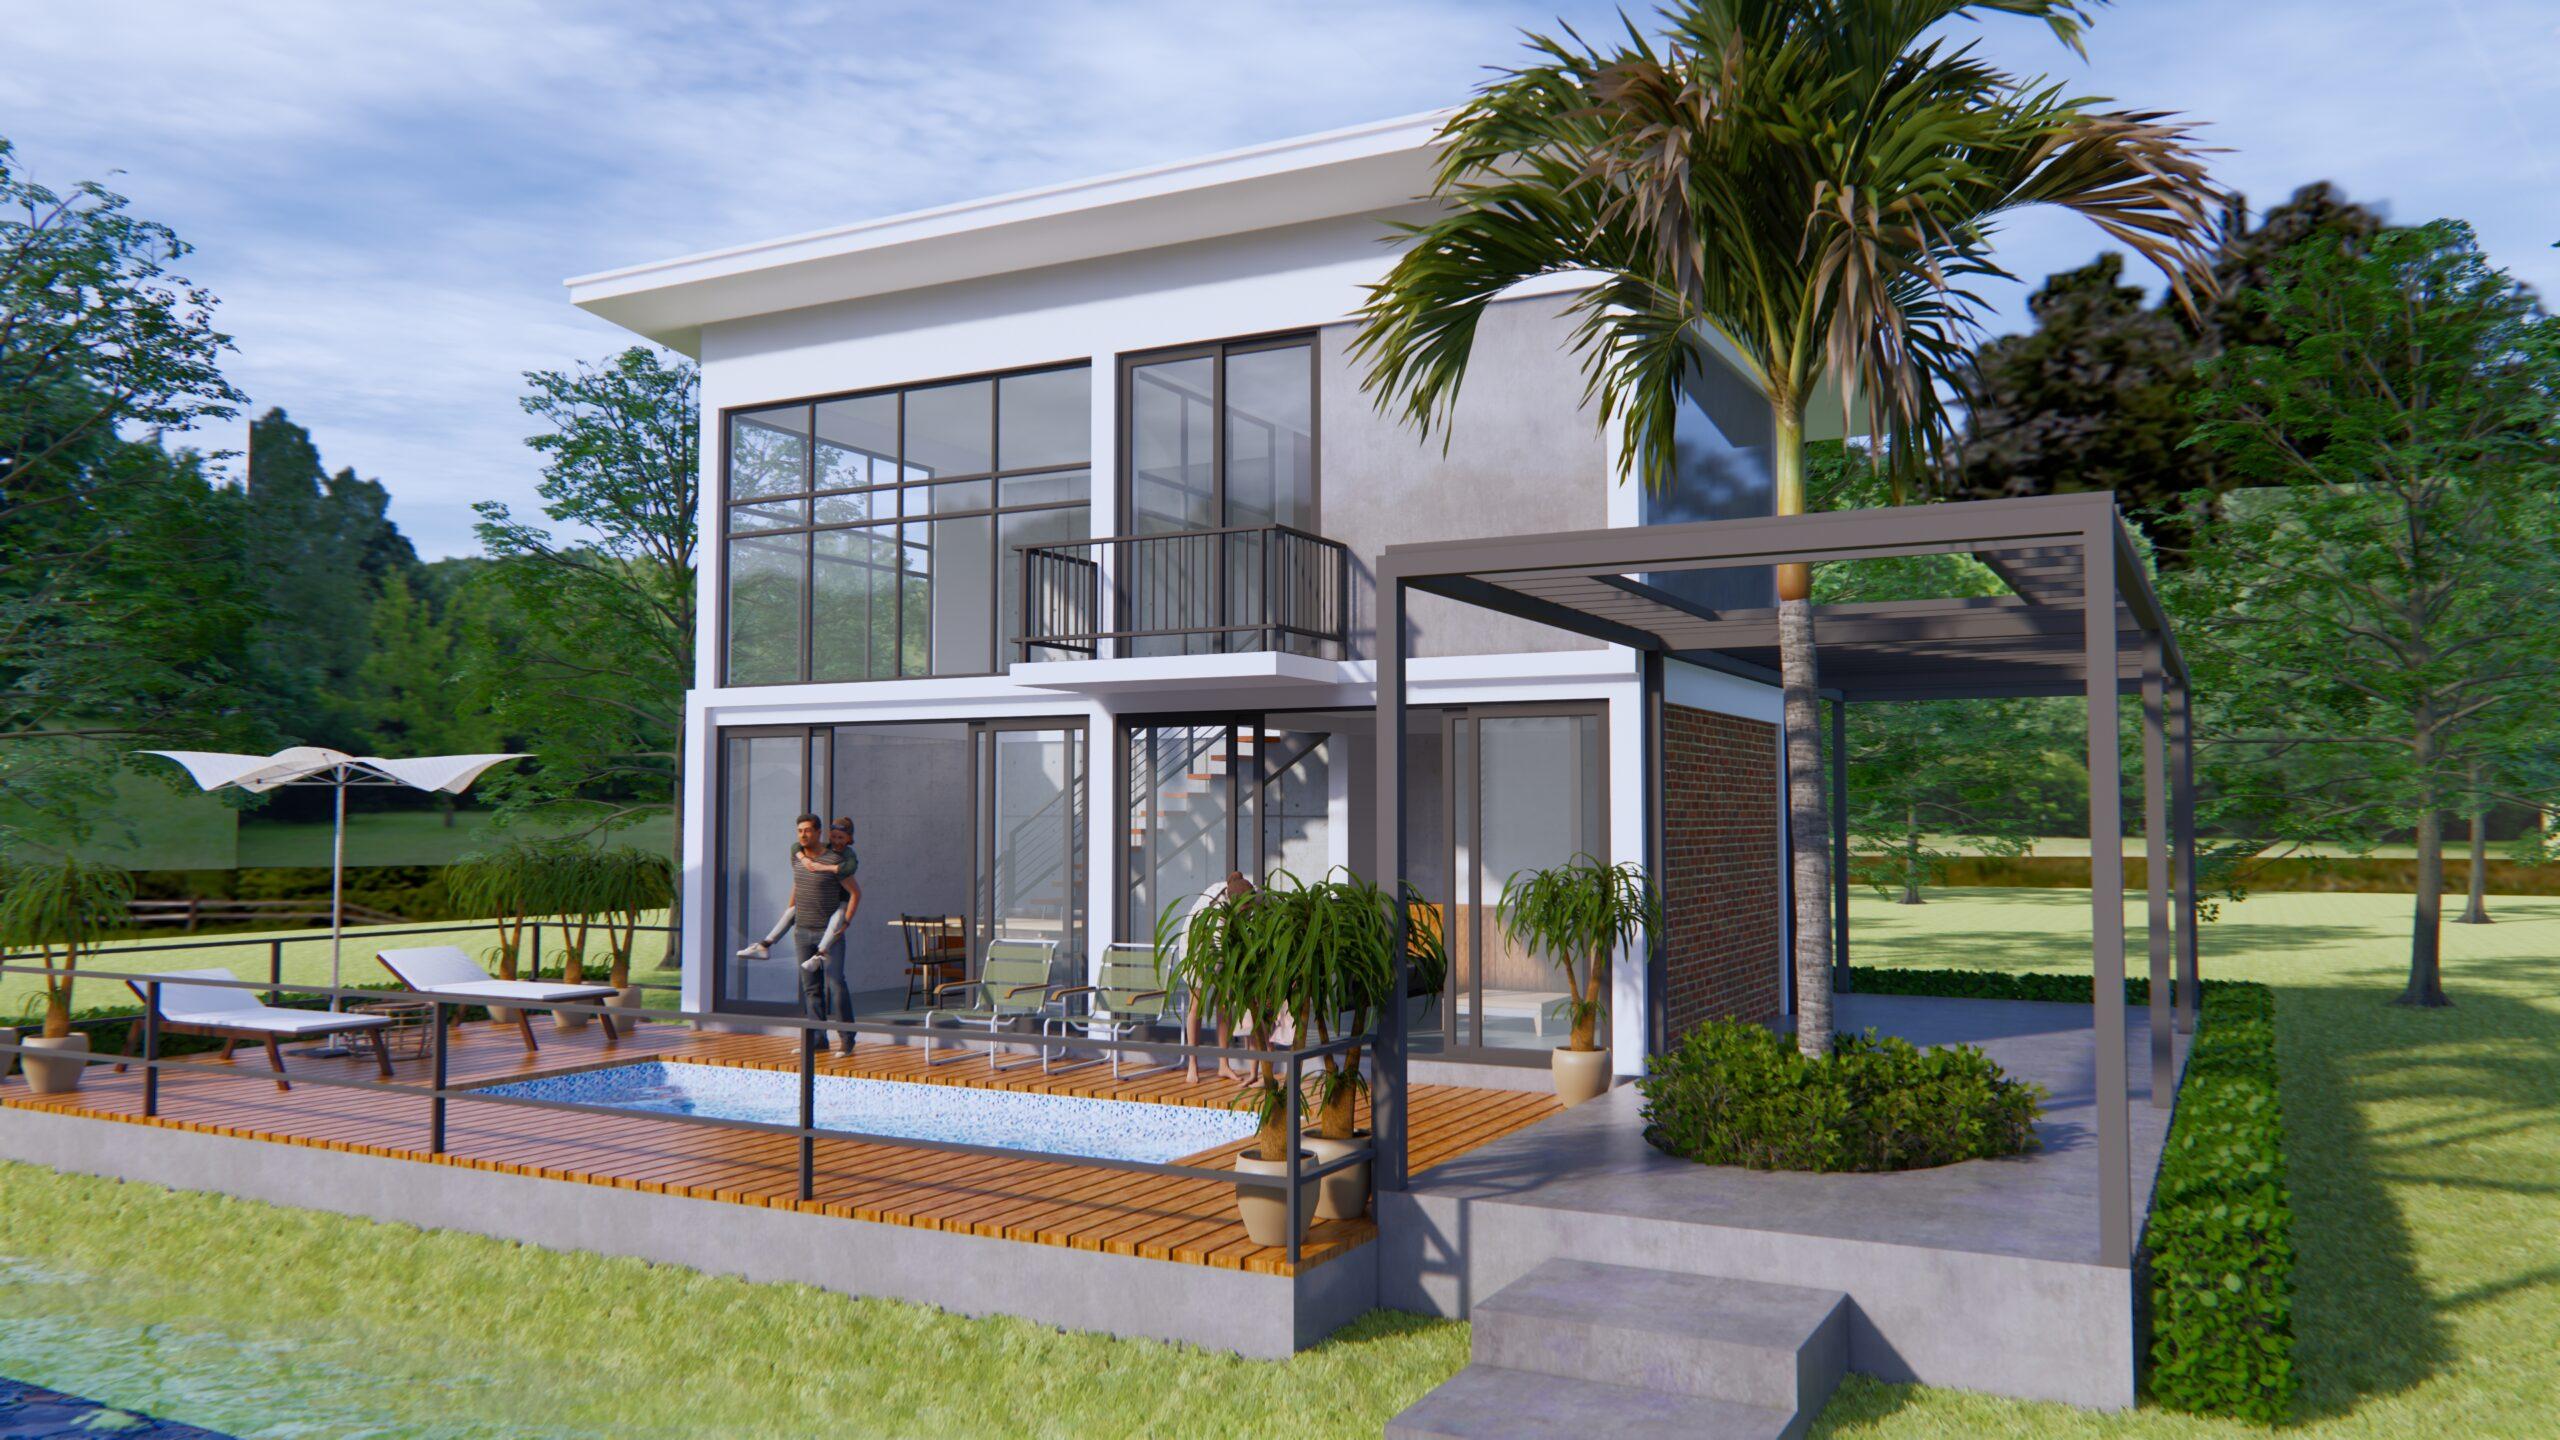 Lake House Plans 13x11 Meter 44x36 Feet 5